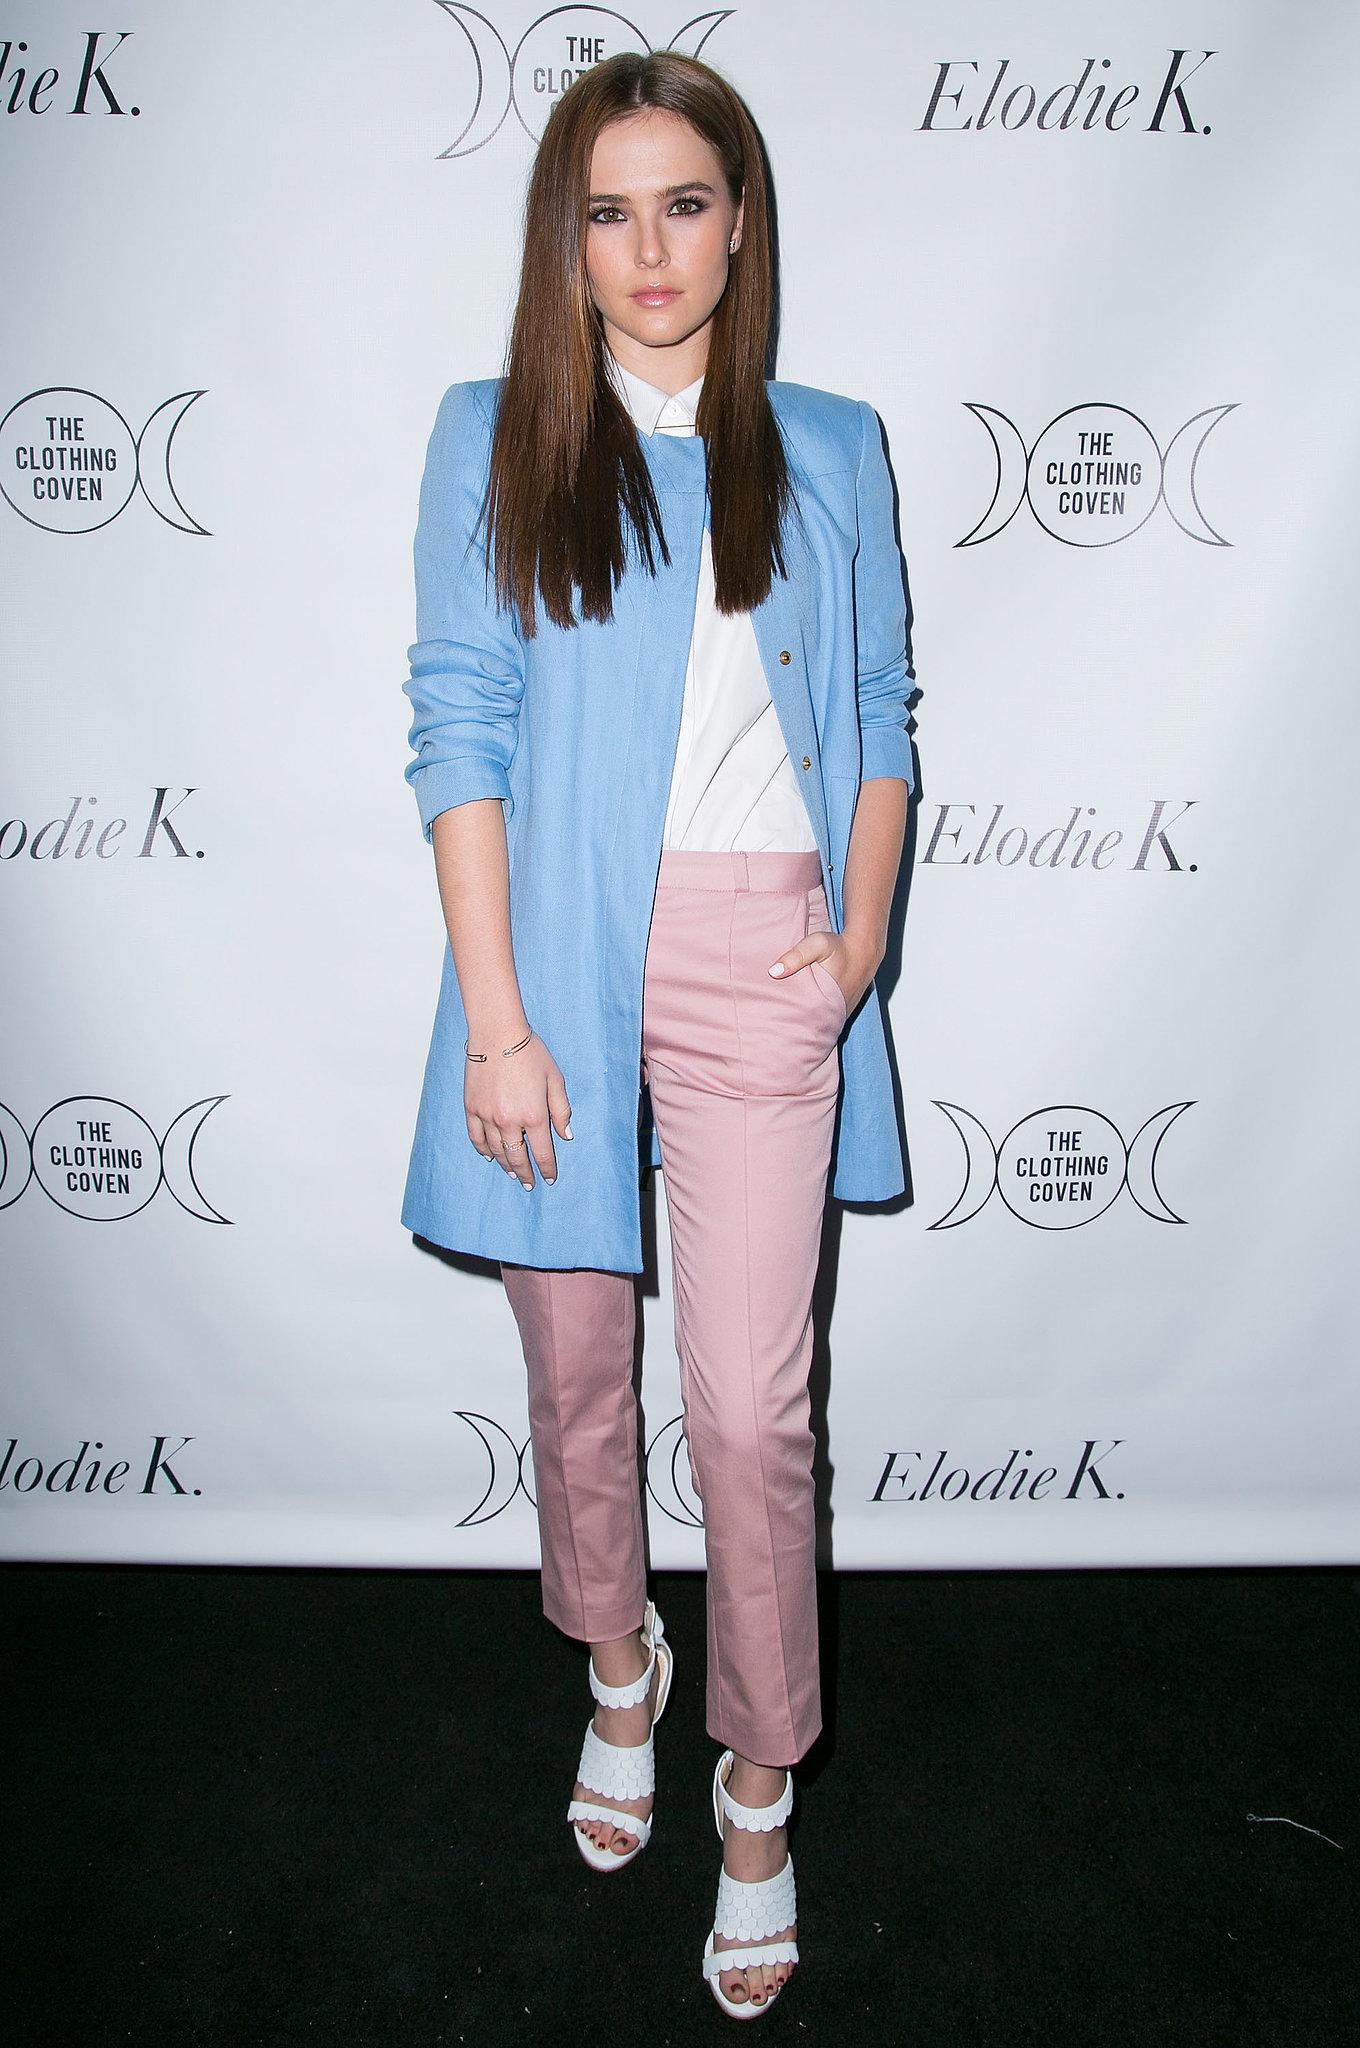 Zoey Deutch style